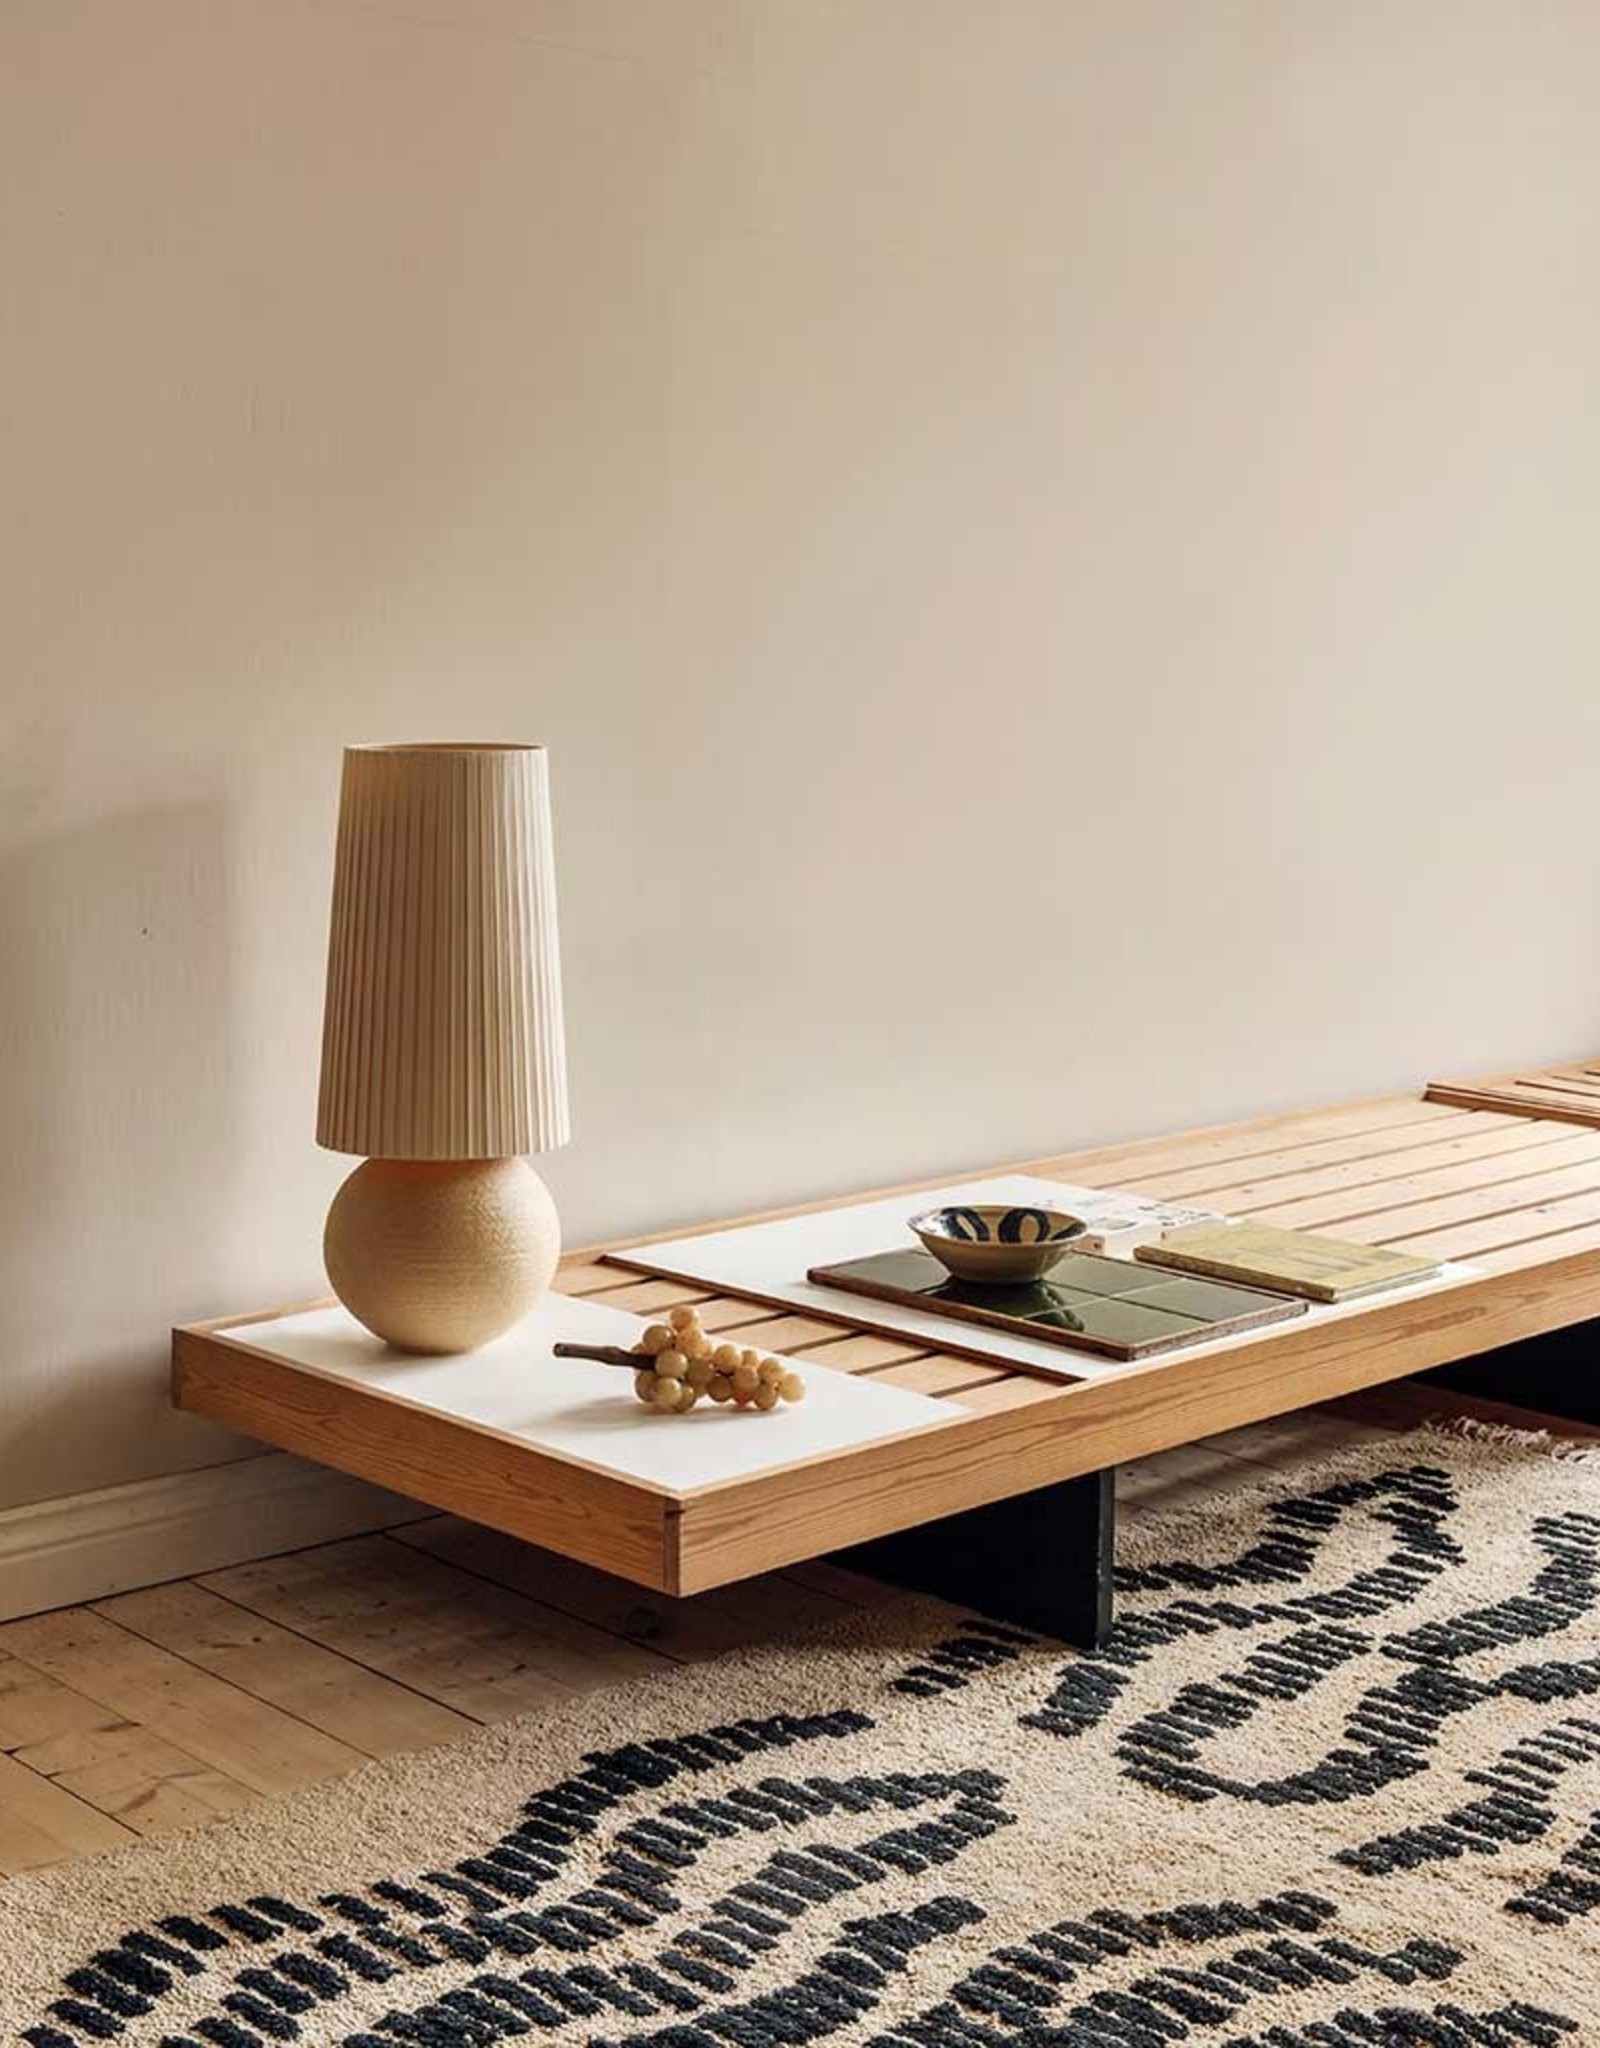 Finarte 'Dyyni' rug recycled cotton